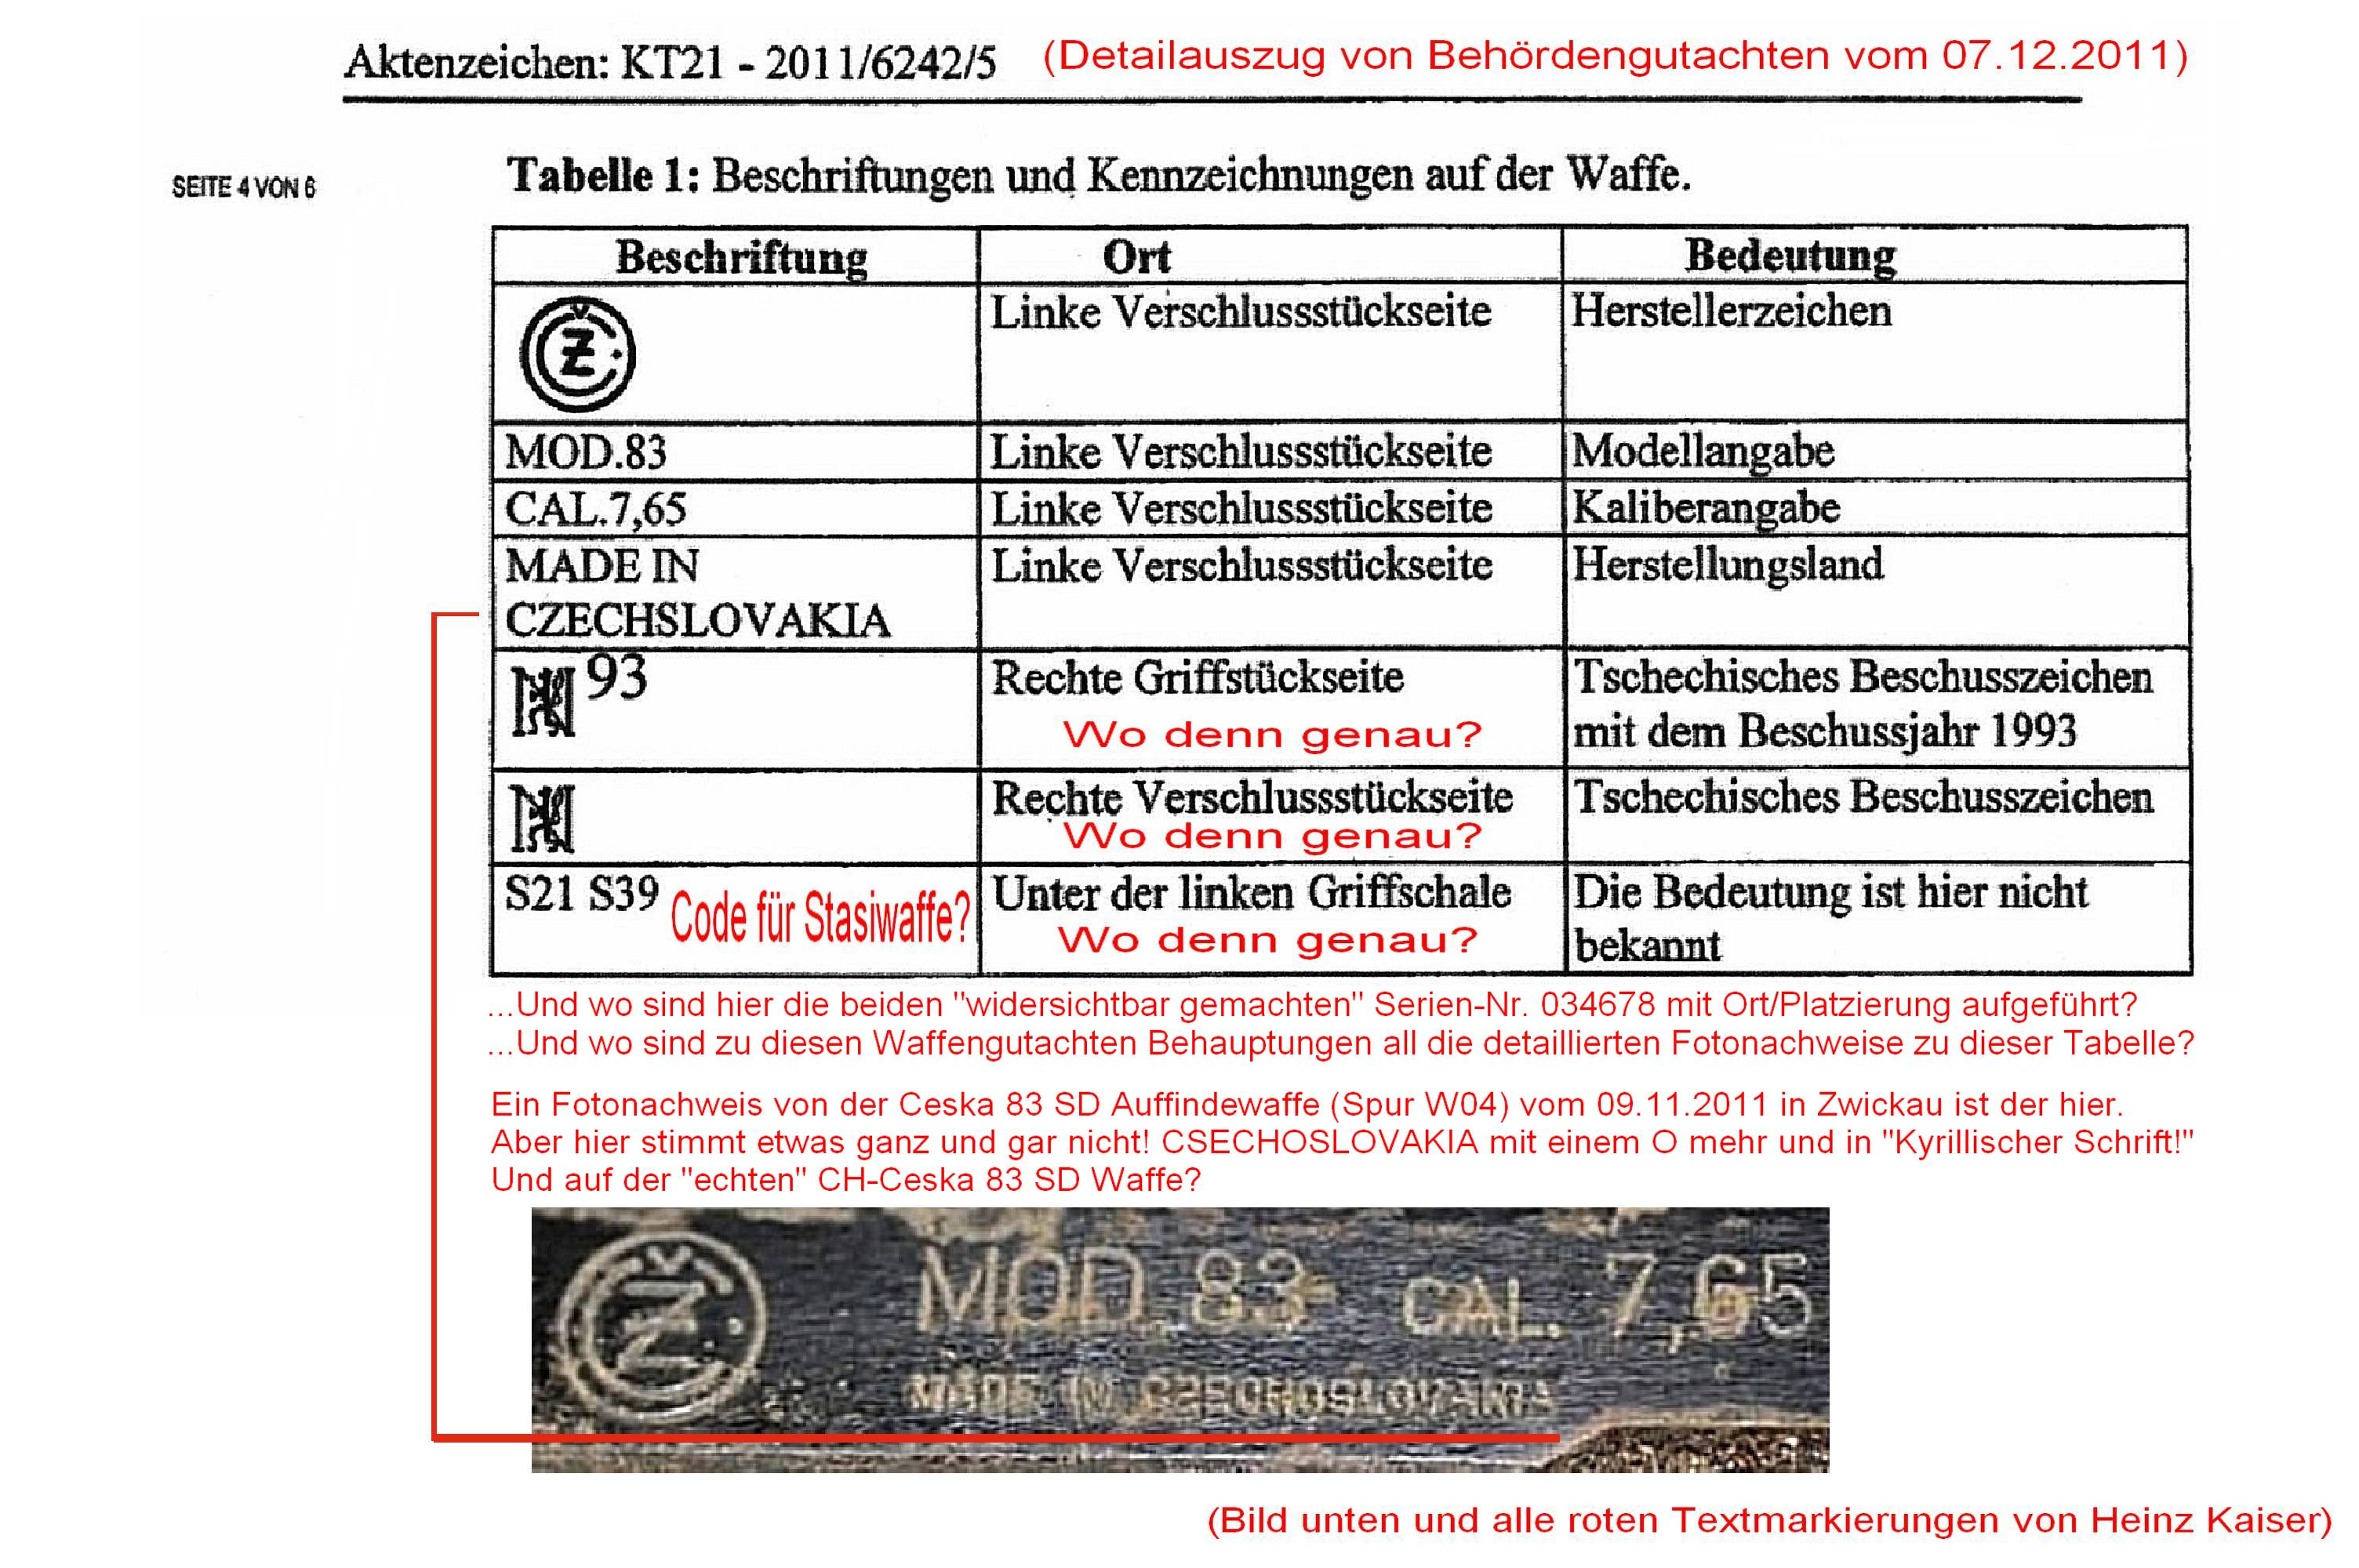 04-ceska-tabelle-von-behoerdengutachten-vom-07-12-2011-fotogroesse